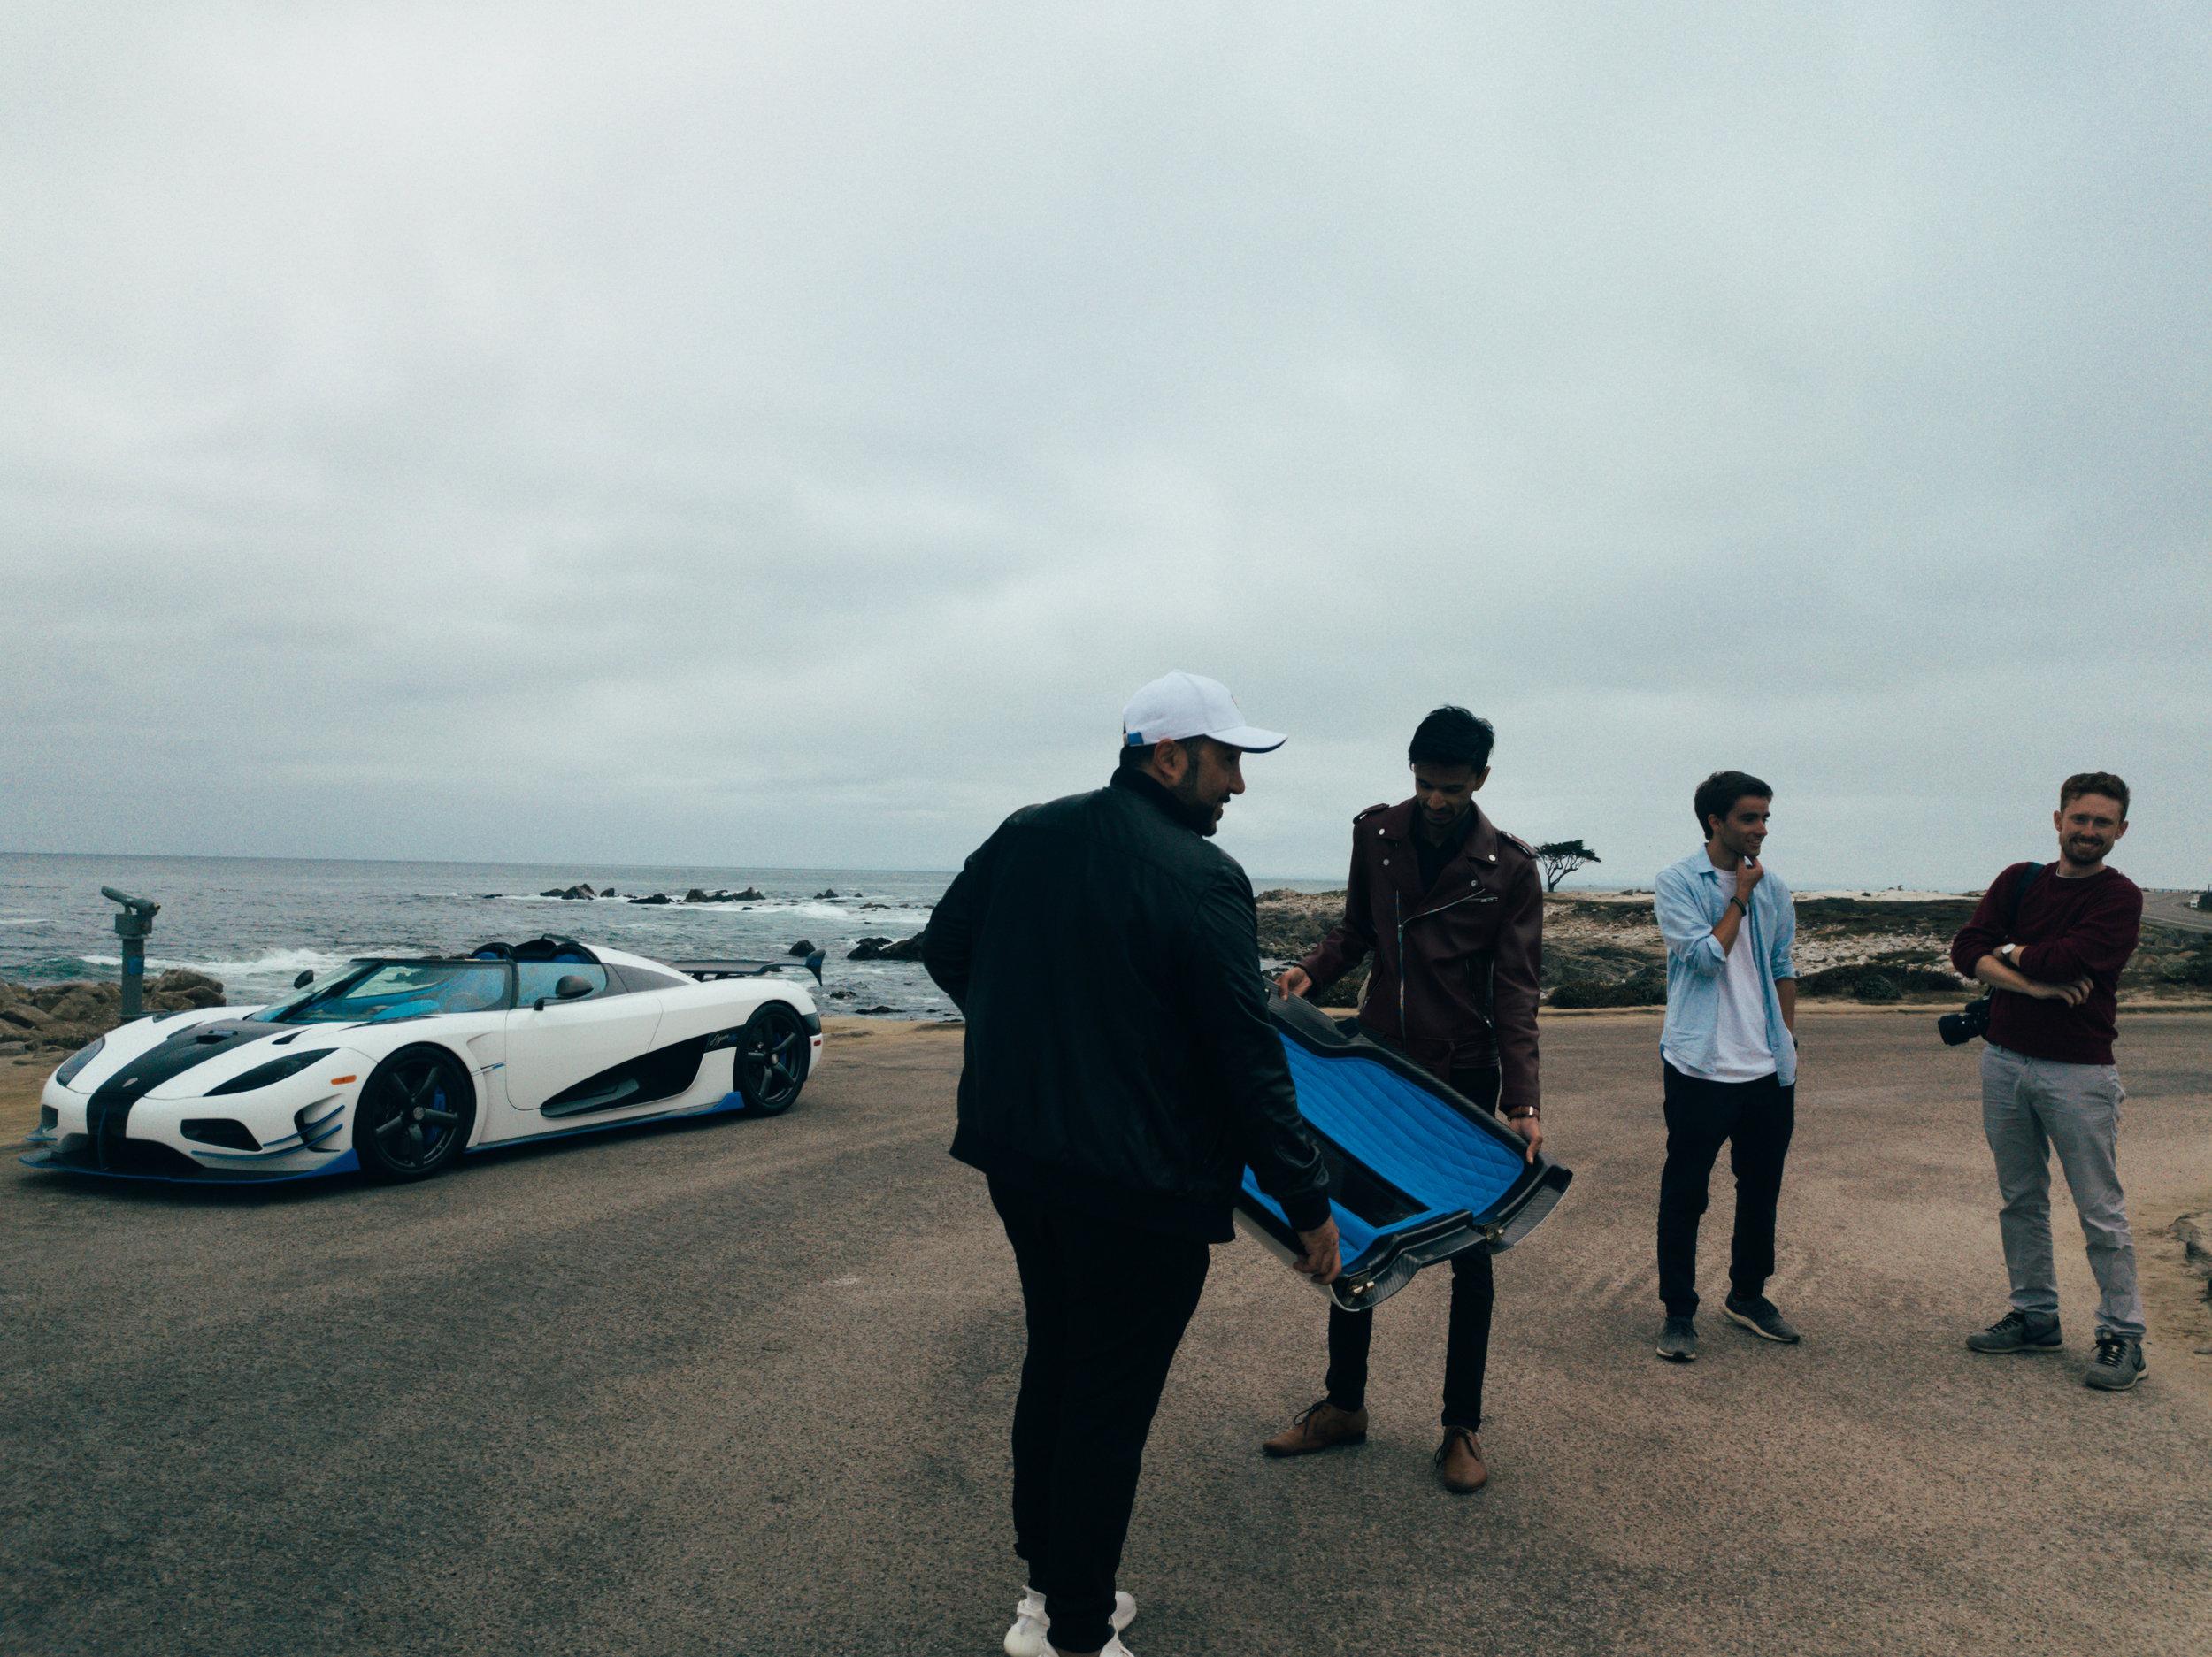 Stay_Driven_Monterey_Car_Week_Whitesse_Koenigsegg-5.jpg